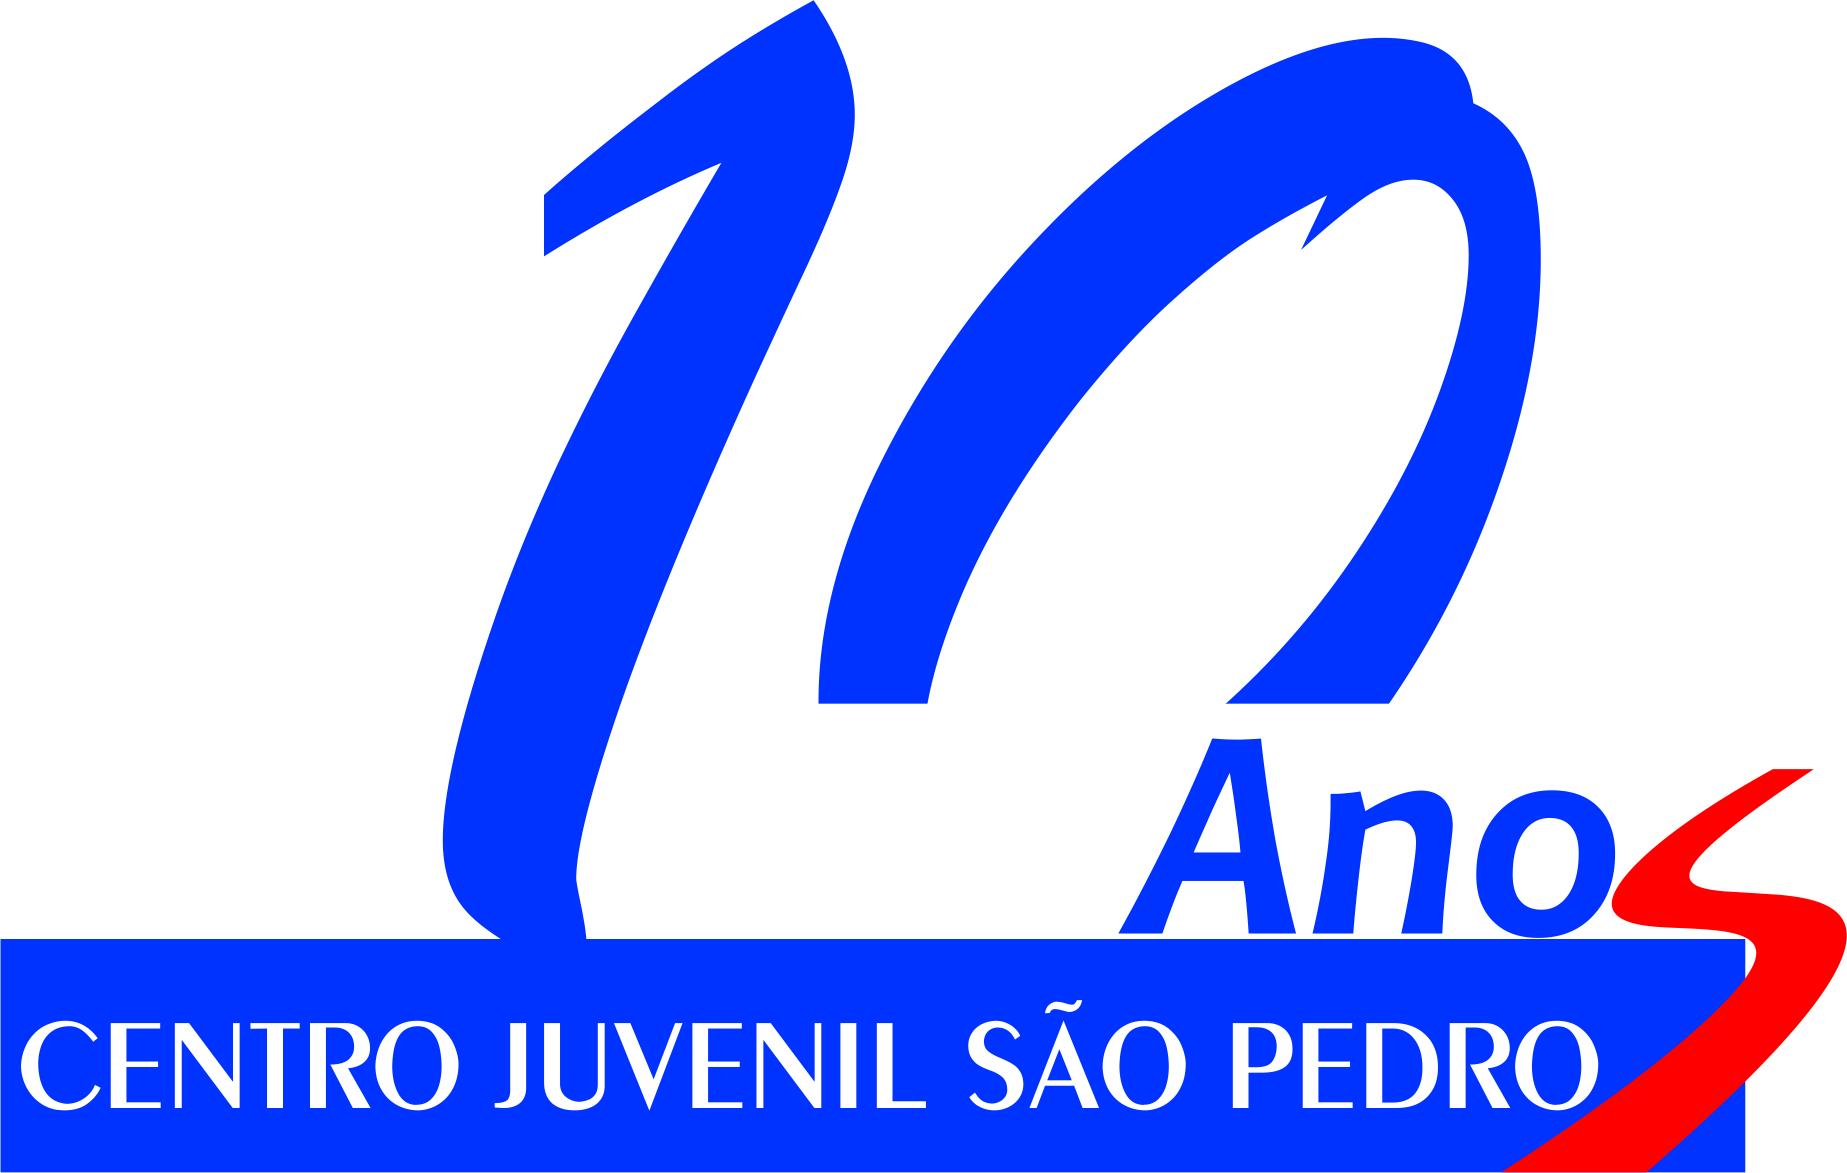 ISJB - Centro Juvenil São Pedro